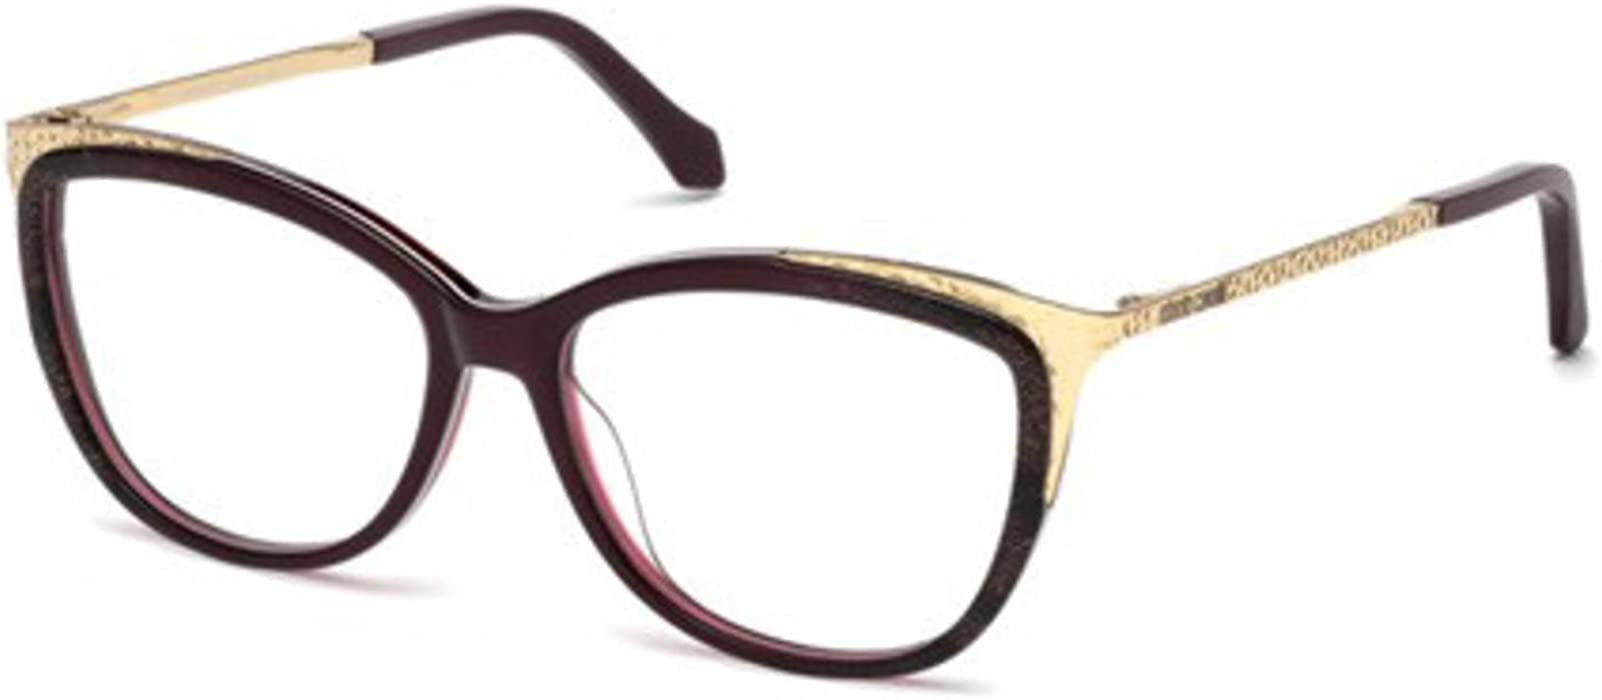 3e7ea752f8 Eyeglasses Roberto Cavalli CAMPORGIANO RC 5031 068 red other at Amazon  Men s Clothing store